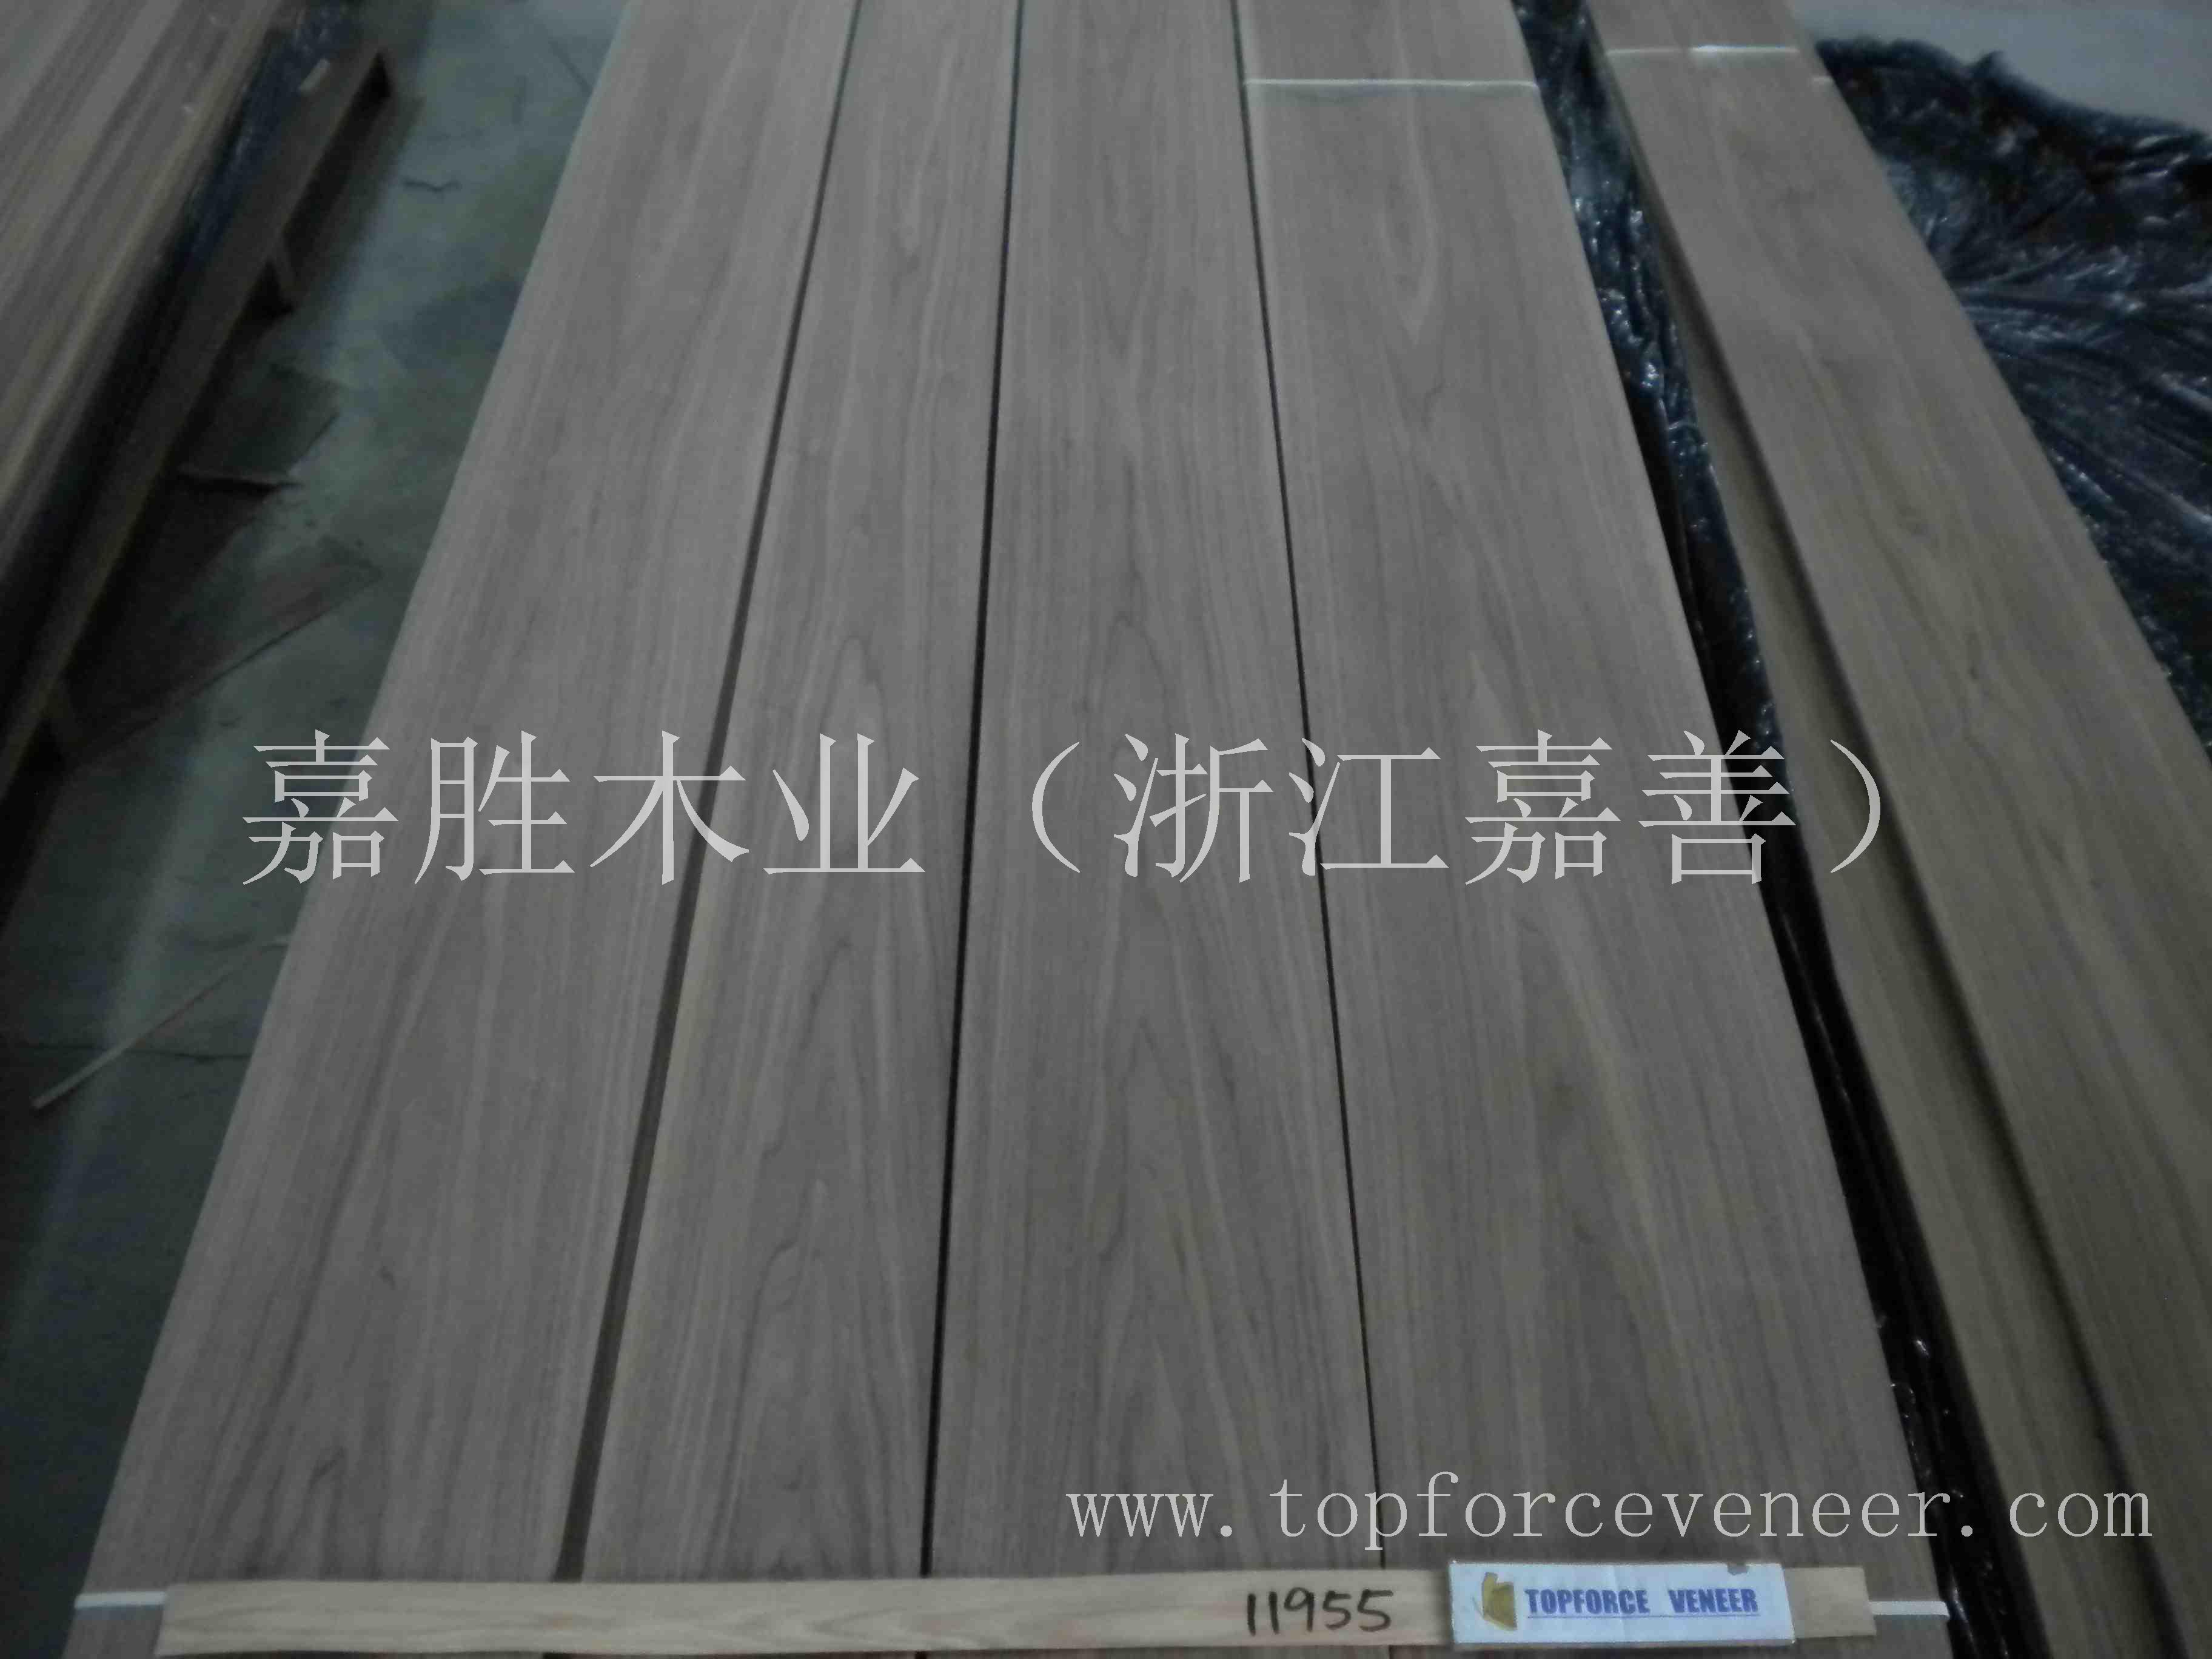 嘉善专业黑胡桃原木ZheJiang JiaXing JiaShan Walnut Veneer and Saw Logs Specialist